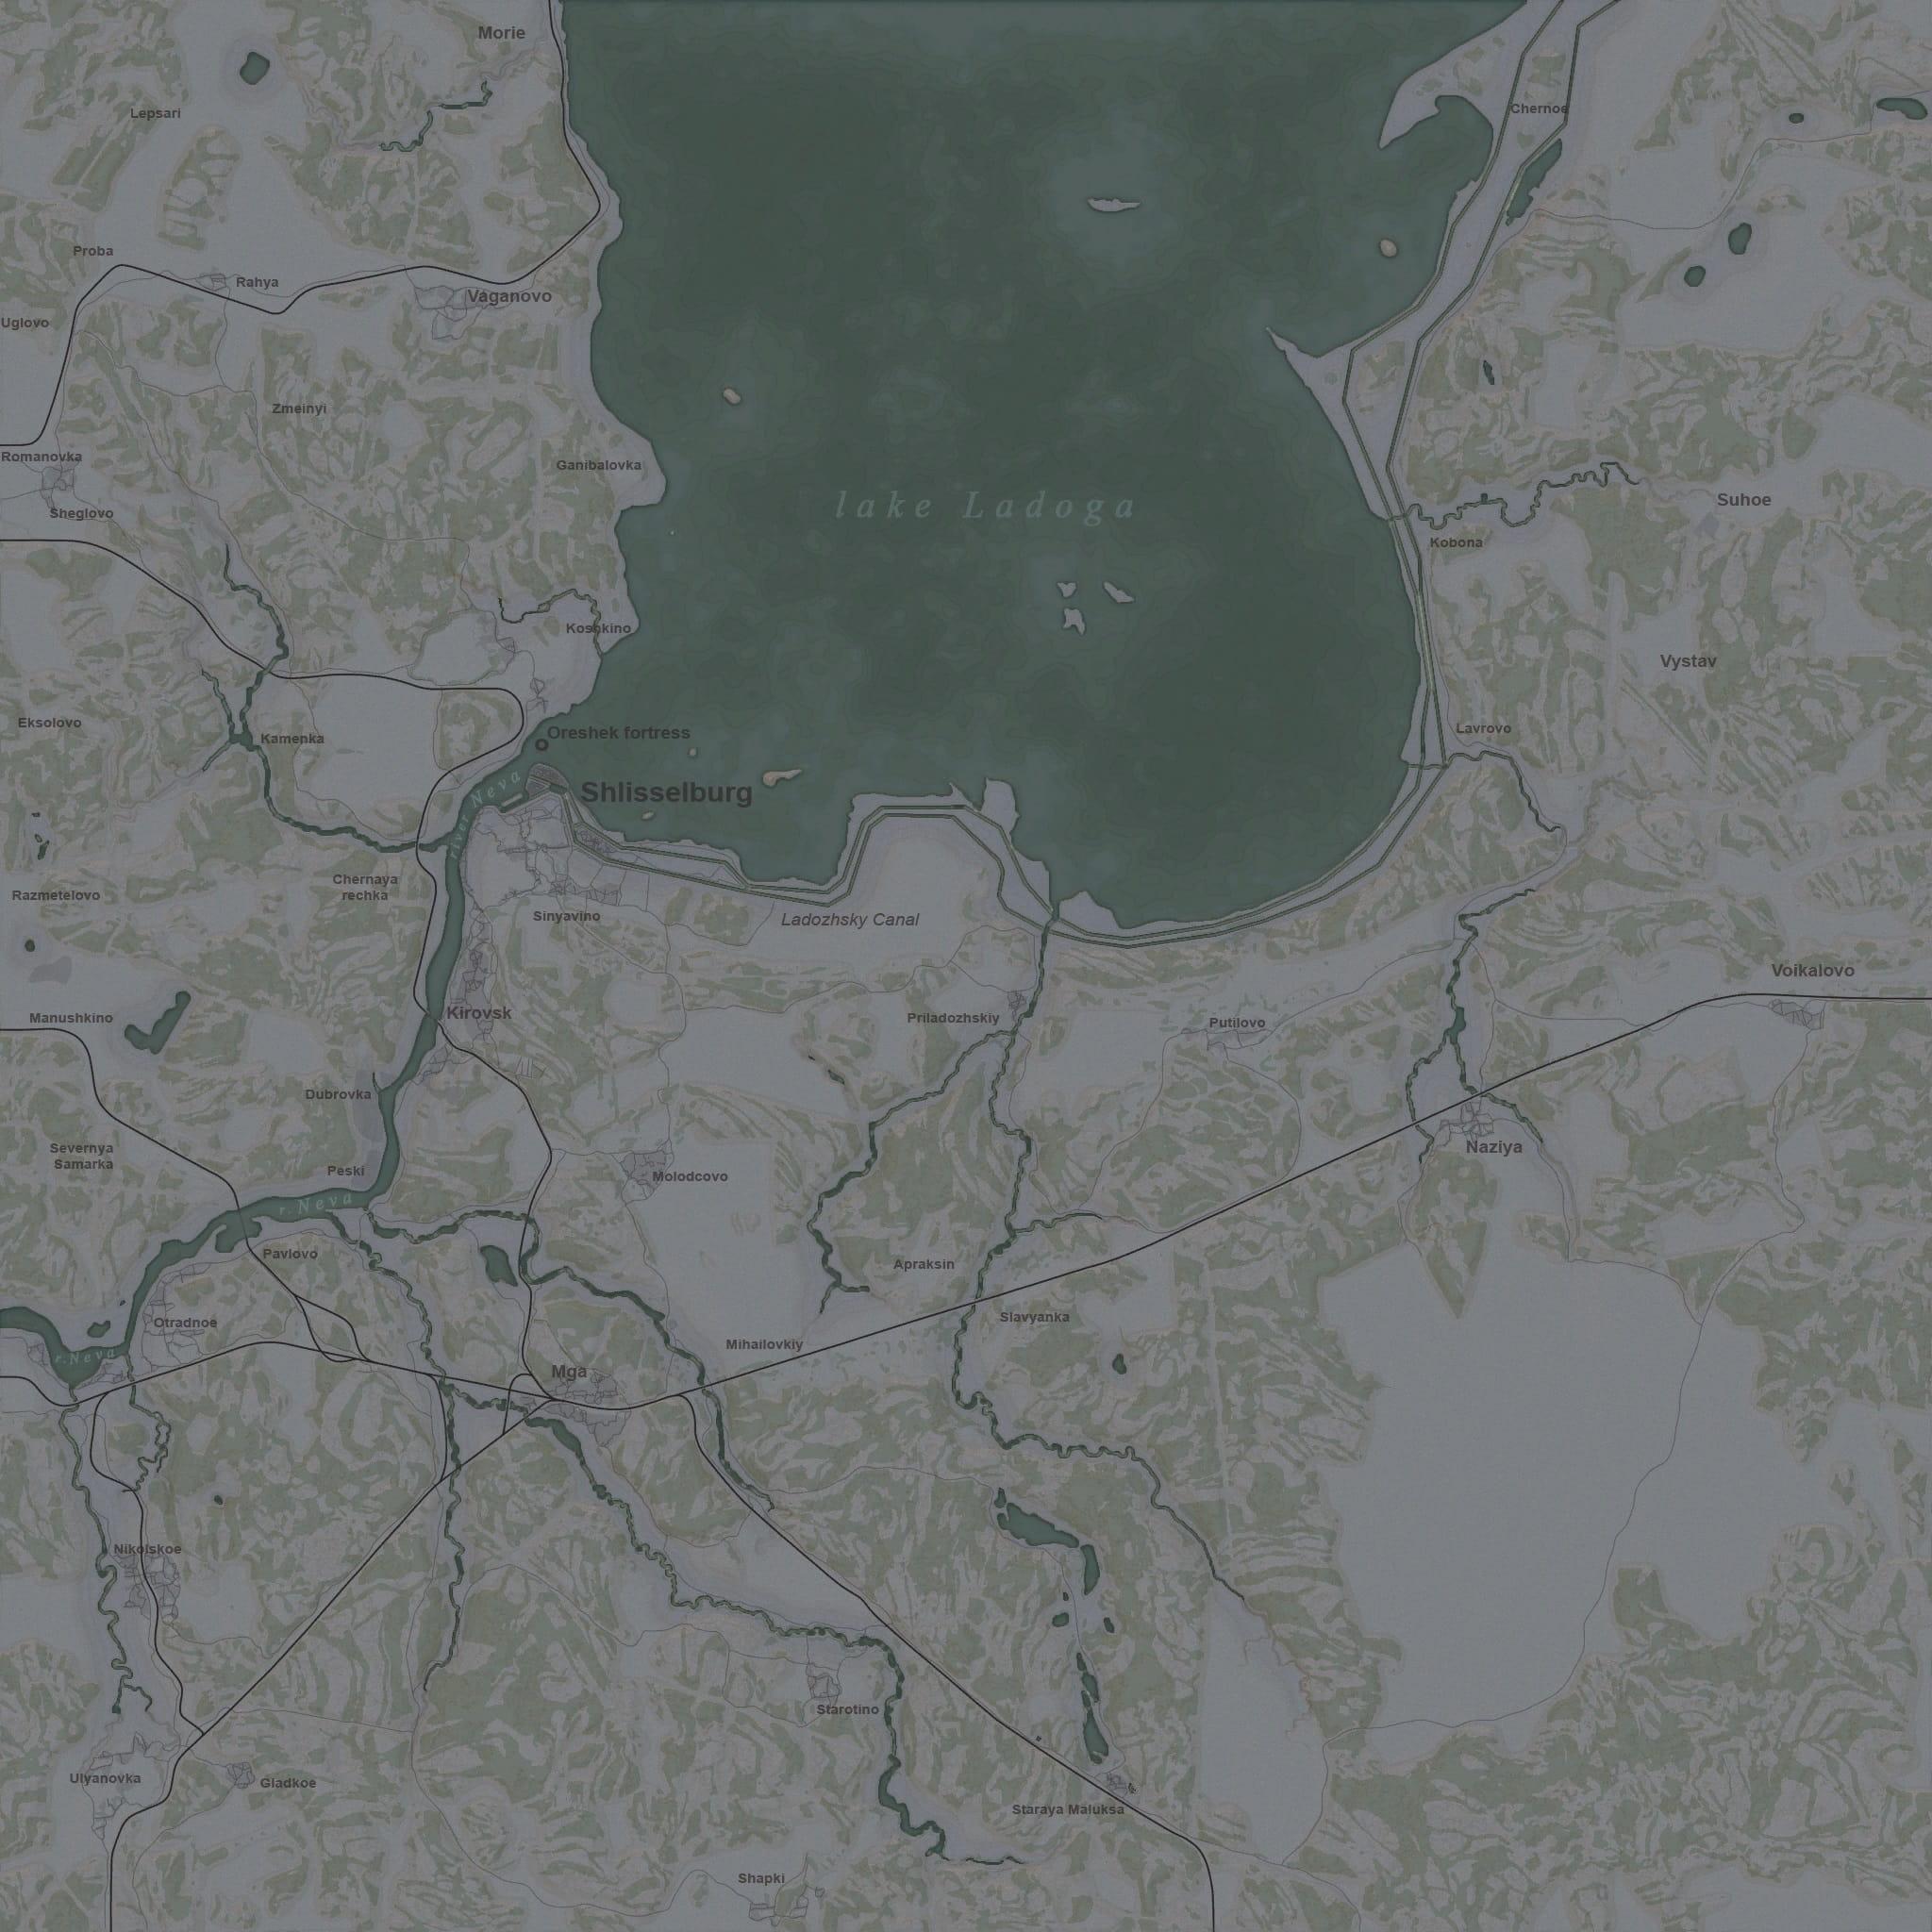 Ladoga_Air_Map-min.jpg